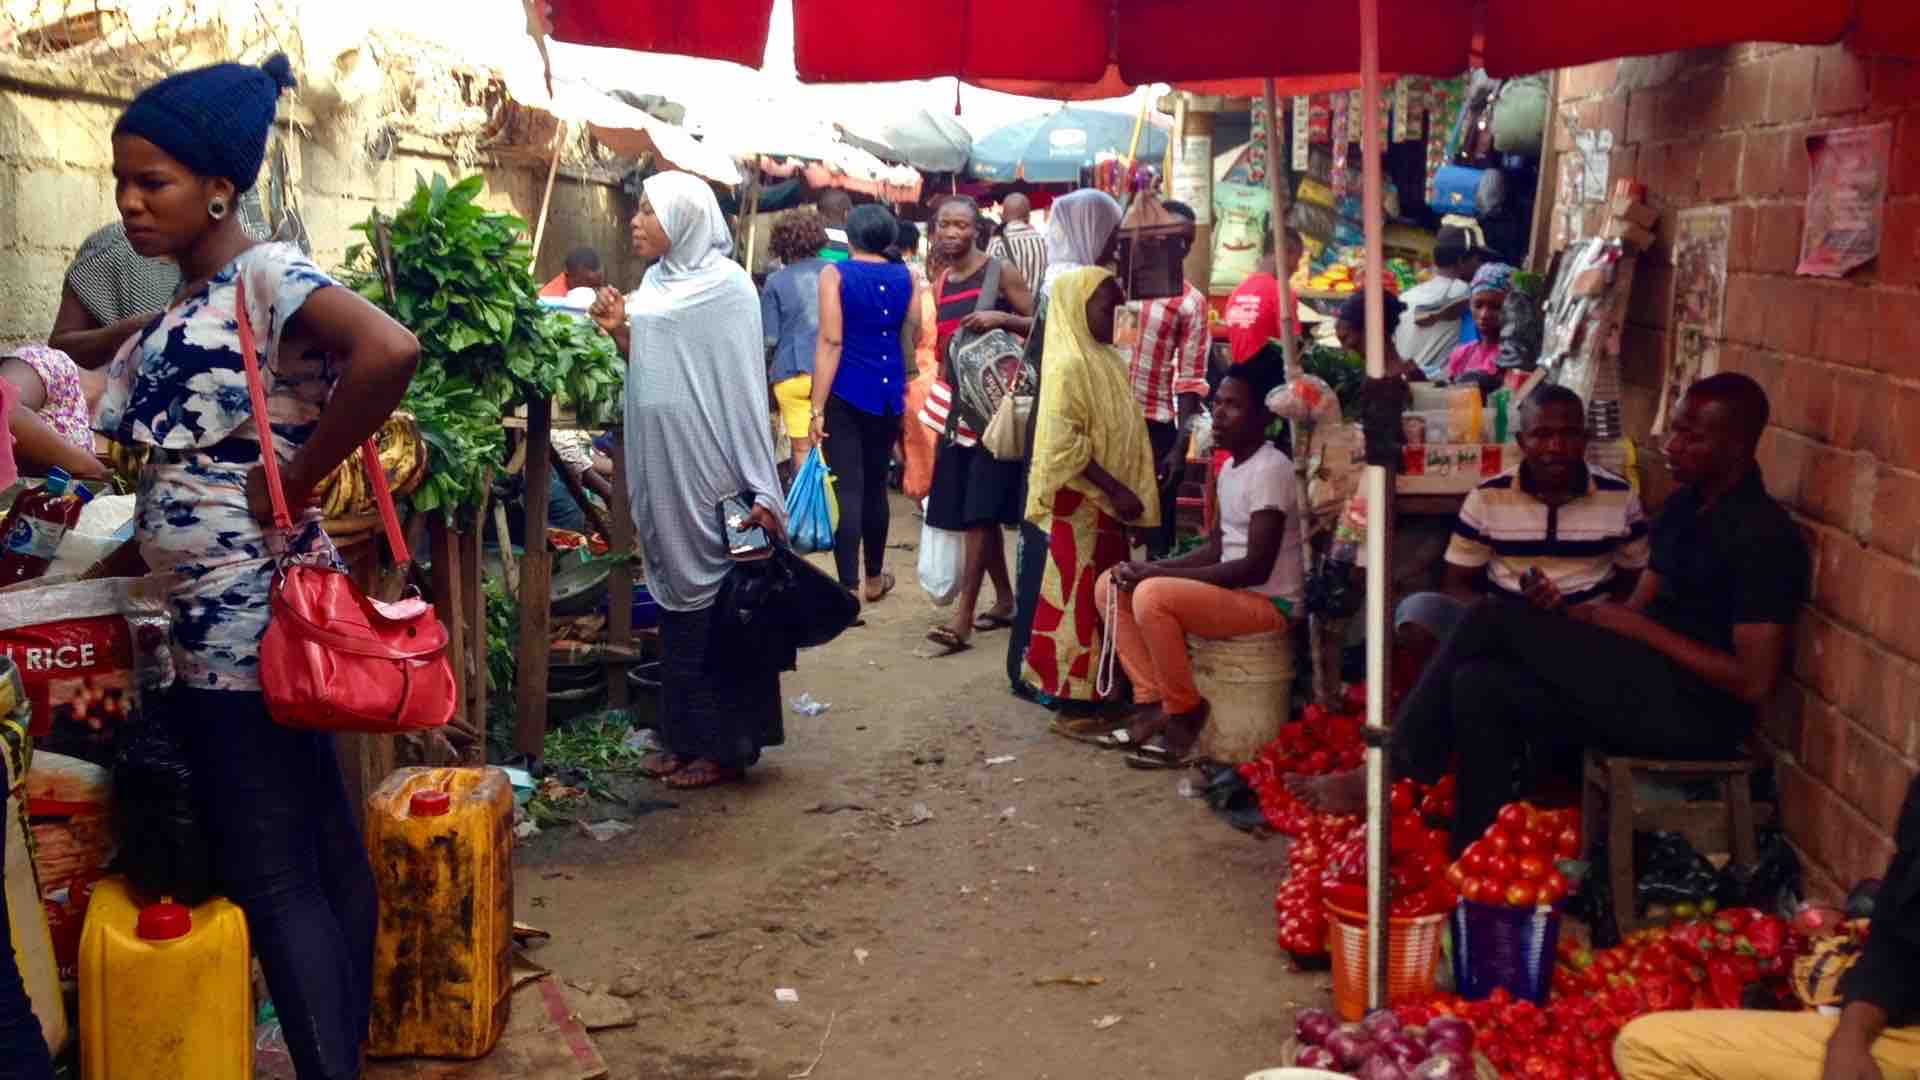 Dutse Market, Dutse, Abuja, Nigeria. #JujuFilms